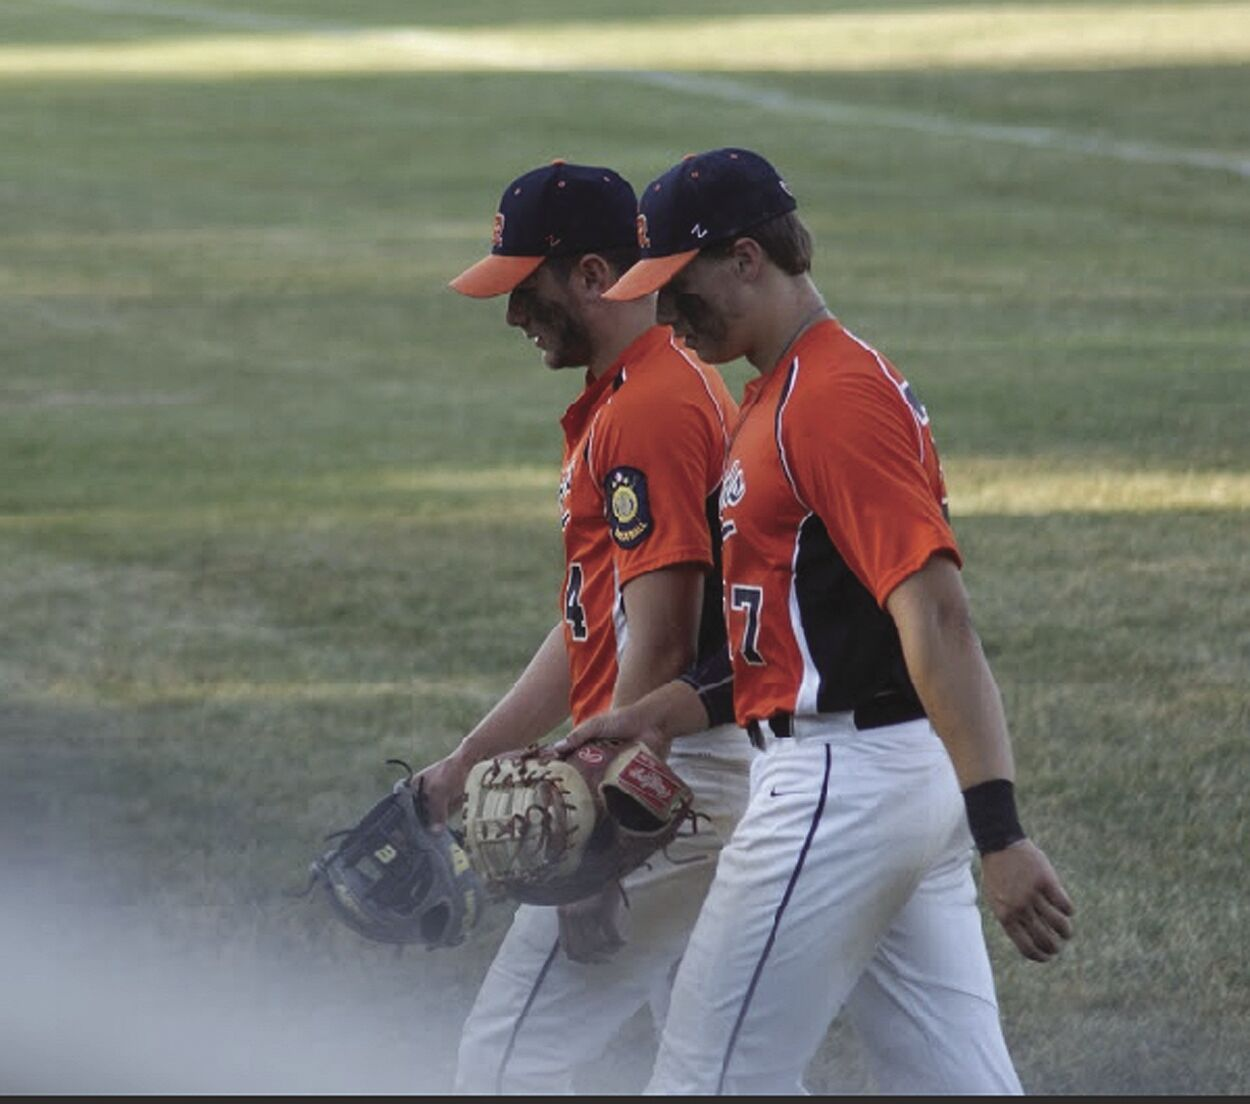 Grand Rapids American Legion baseball